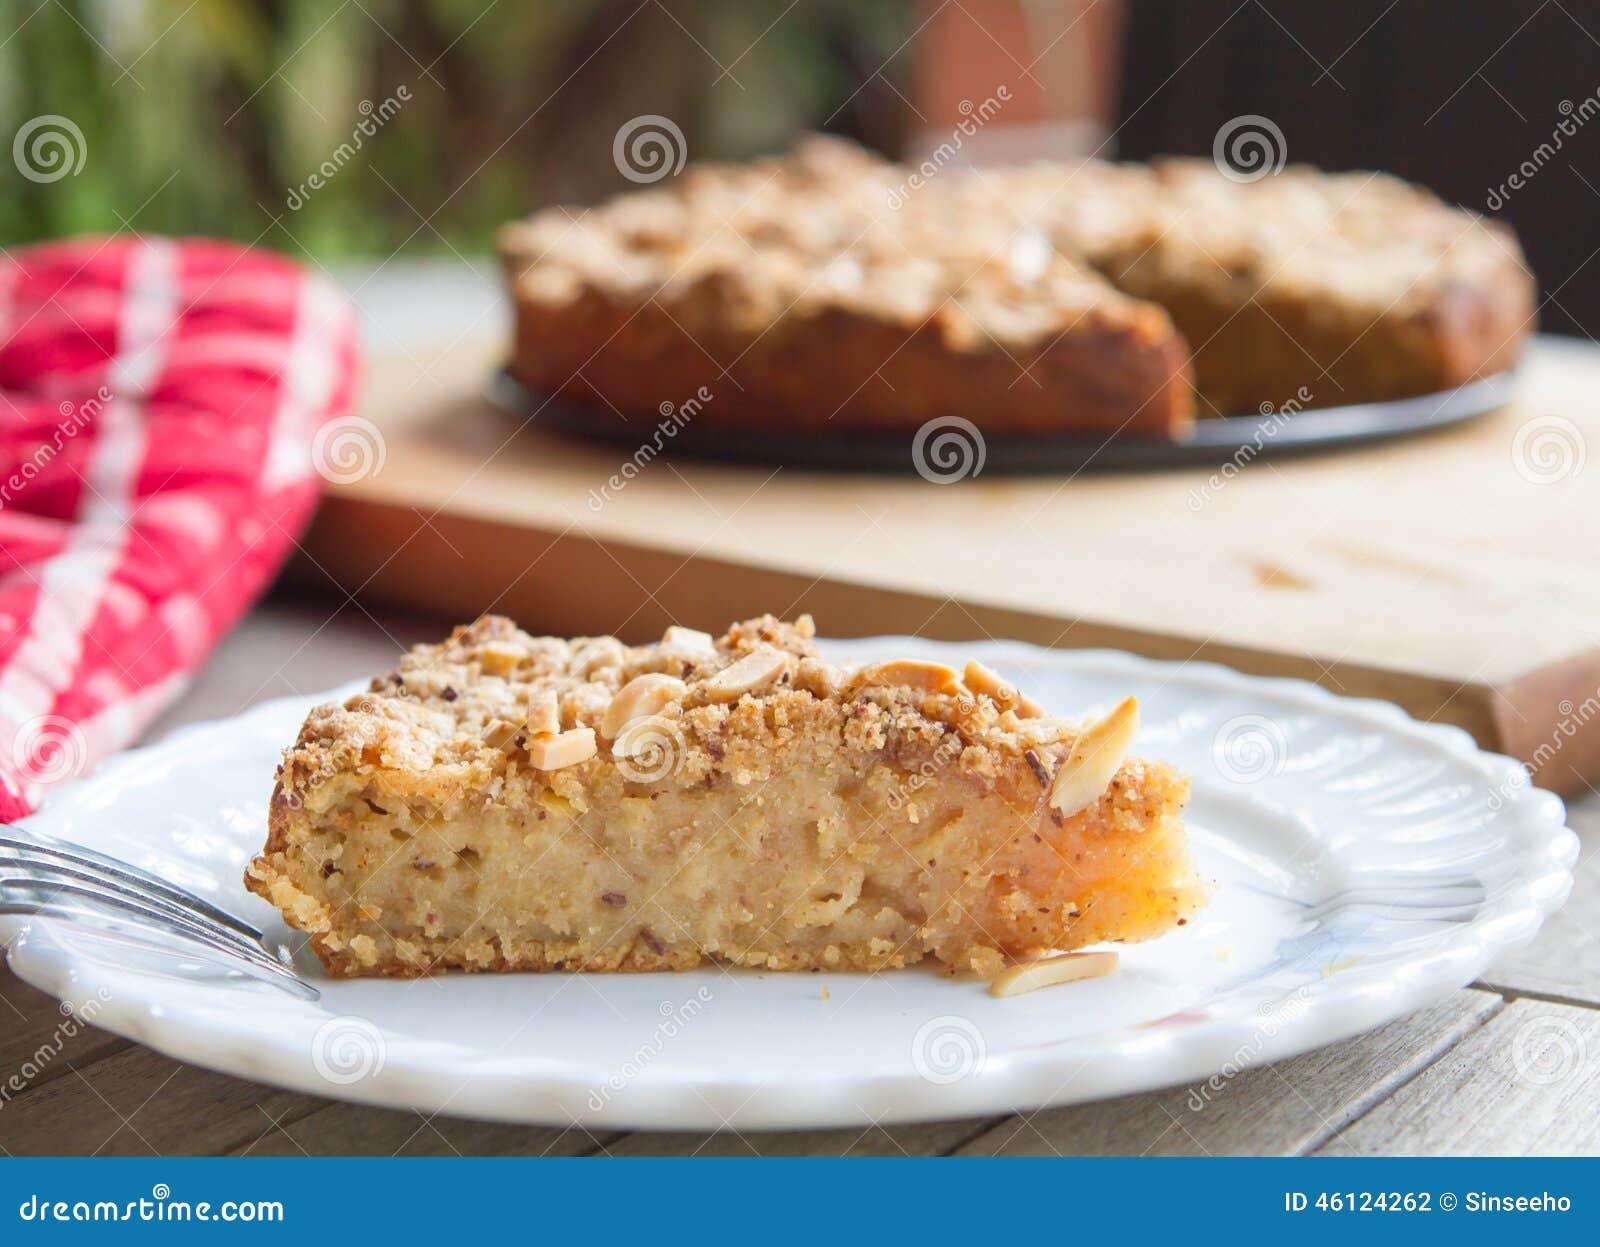 Grated Apple Sponge Cake